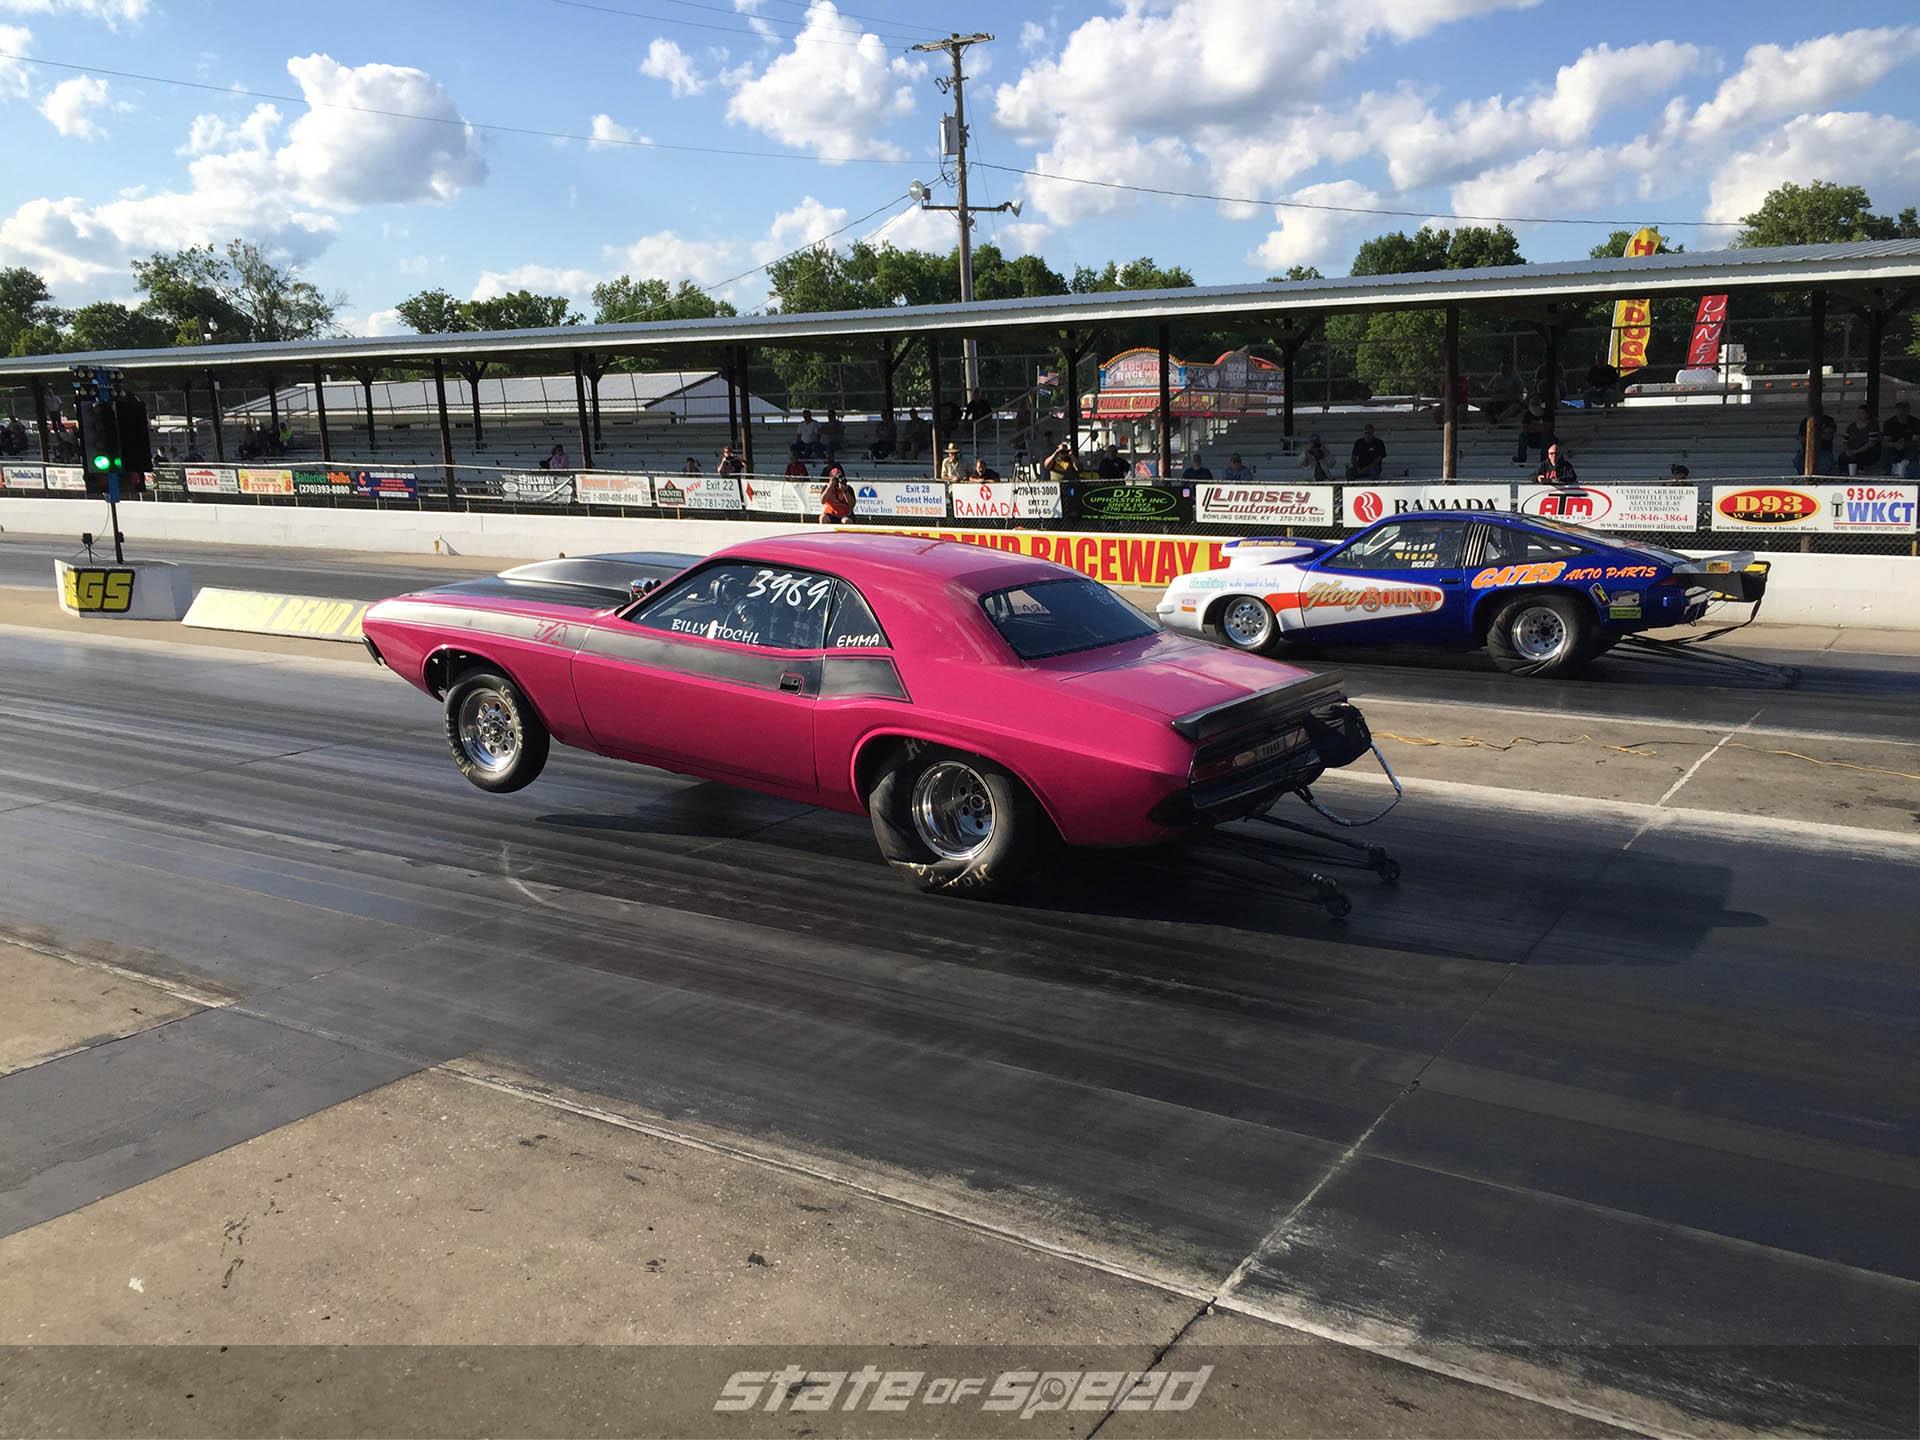 Dodge Challenger Dragstrip launch